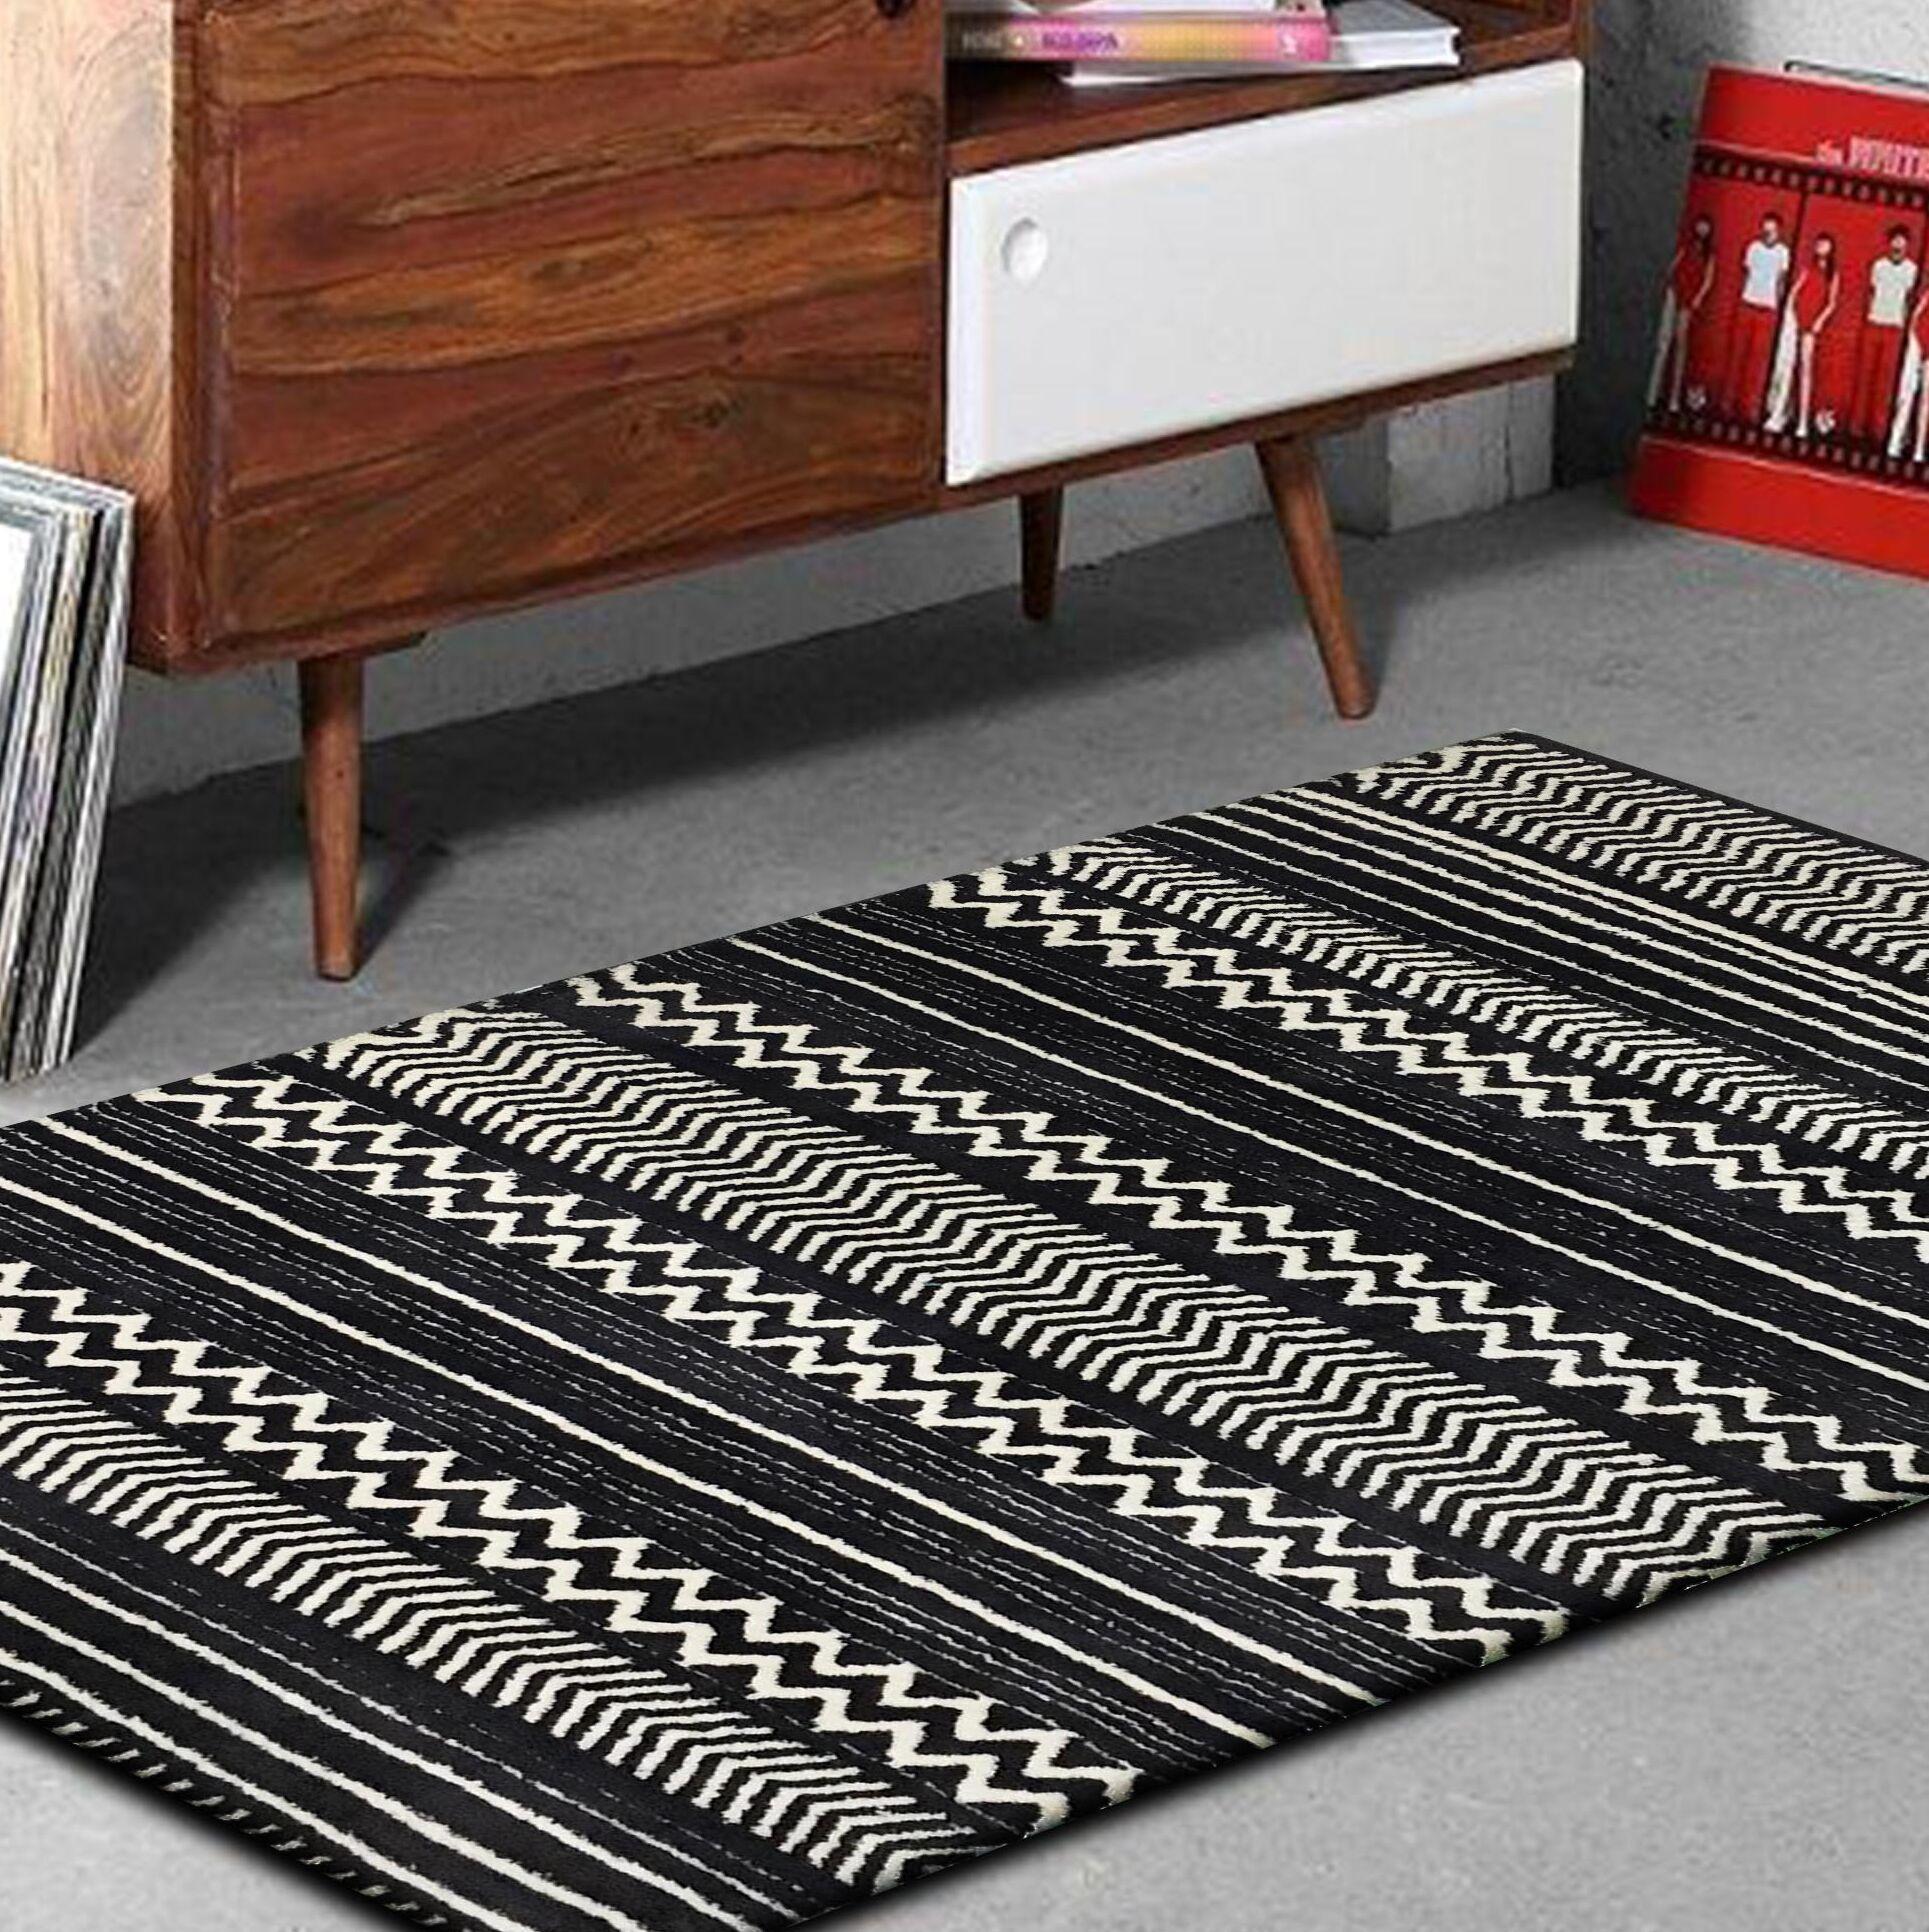 Byrnes Hand-Tufted Black/White Indoor Area Rug Rug Size: Rectangle 7'6